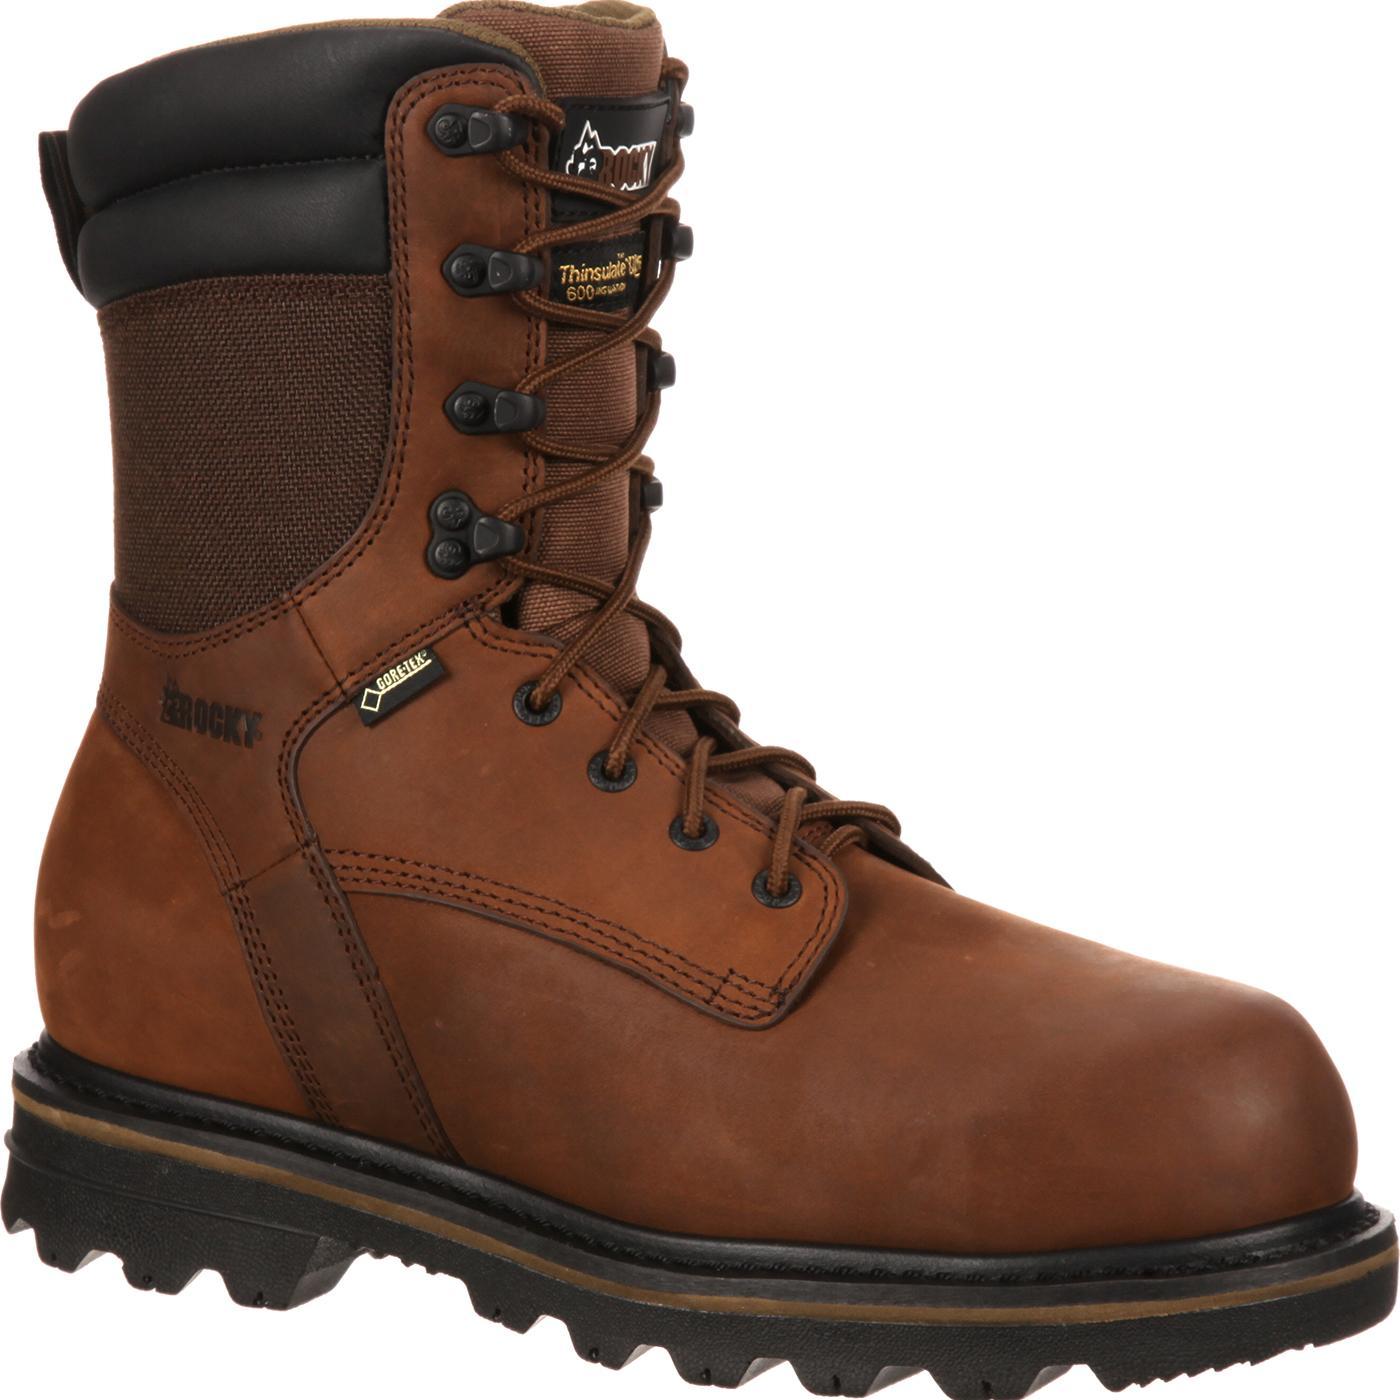 Rocky Cornstalker Safety Toe Waterproof Insulated Work Boot